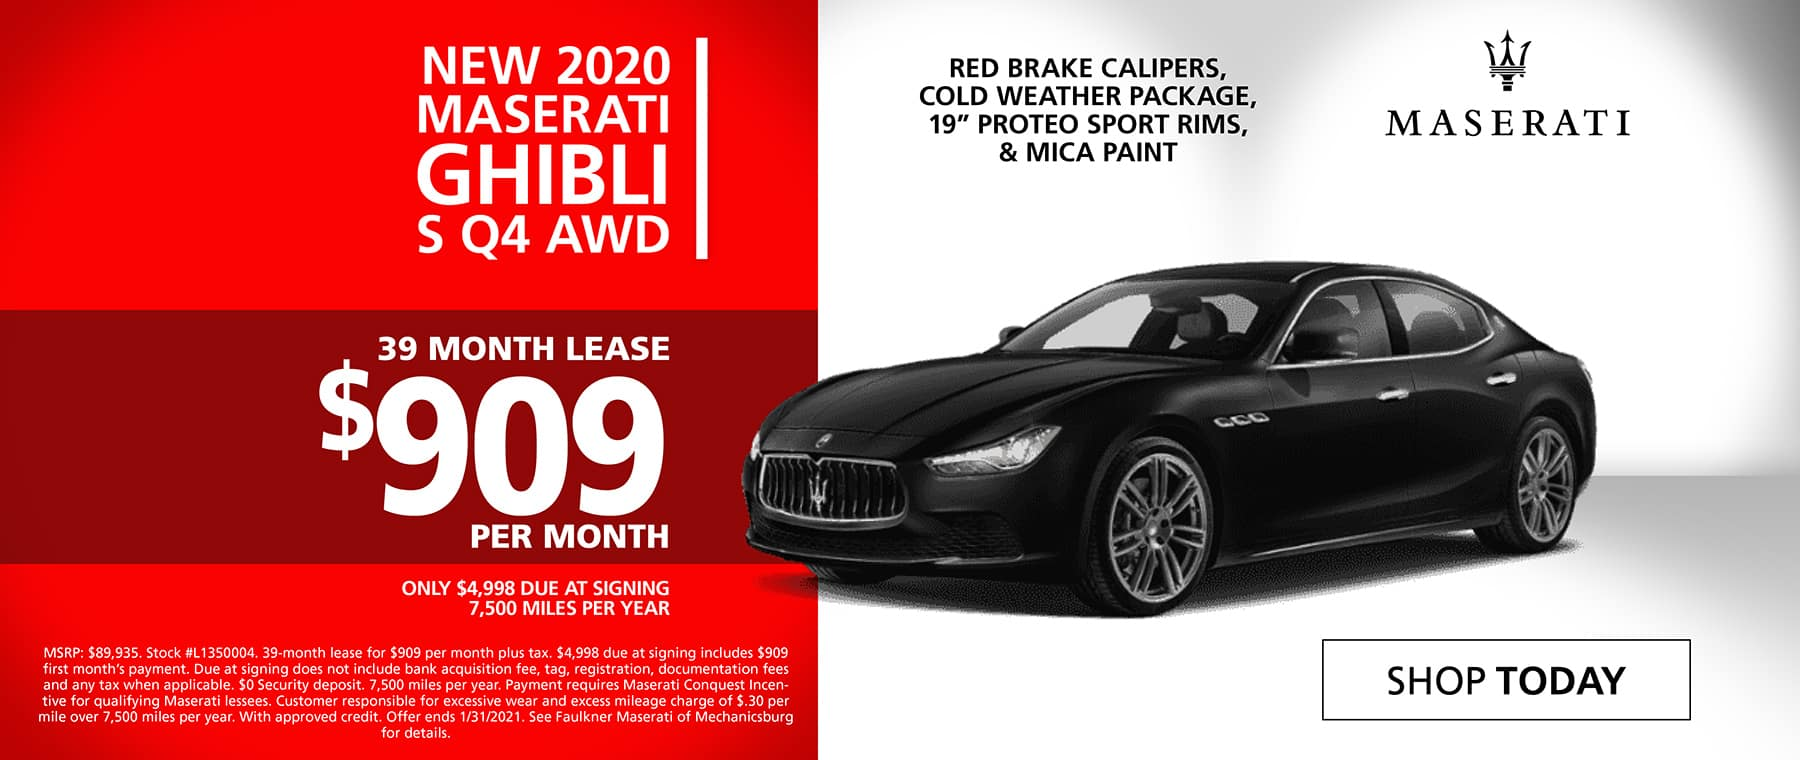 Shop New 2020 Maserati Ghibli